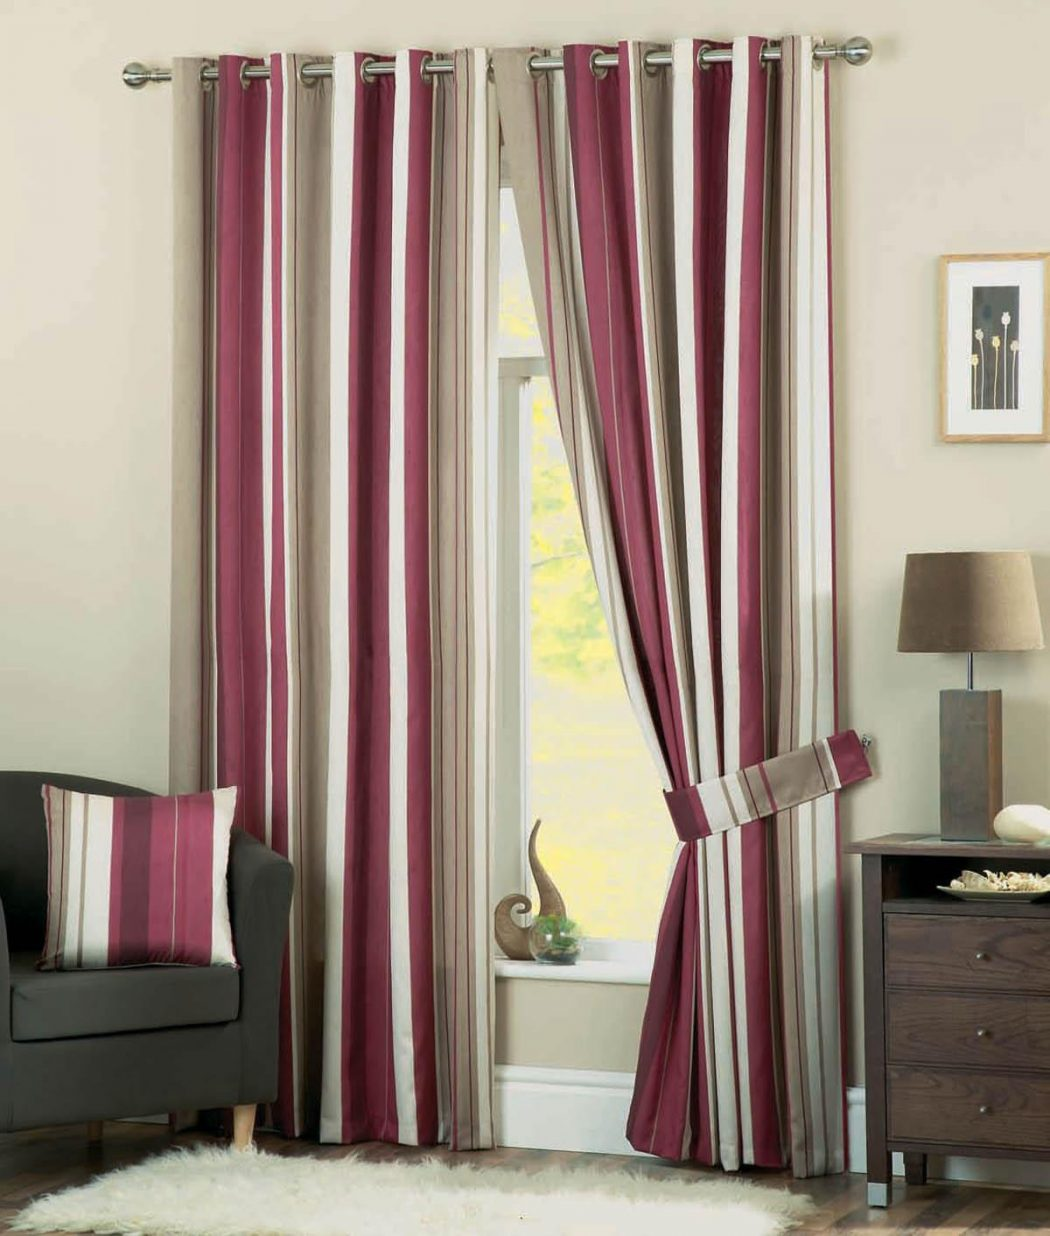 Whitworth-Claret 20+ Hottest Curtain Design Ideas for 2020